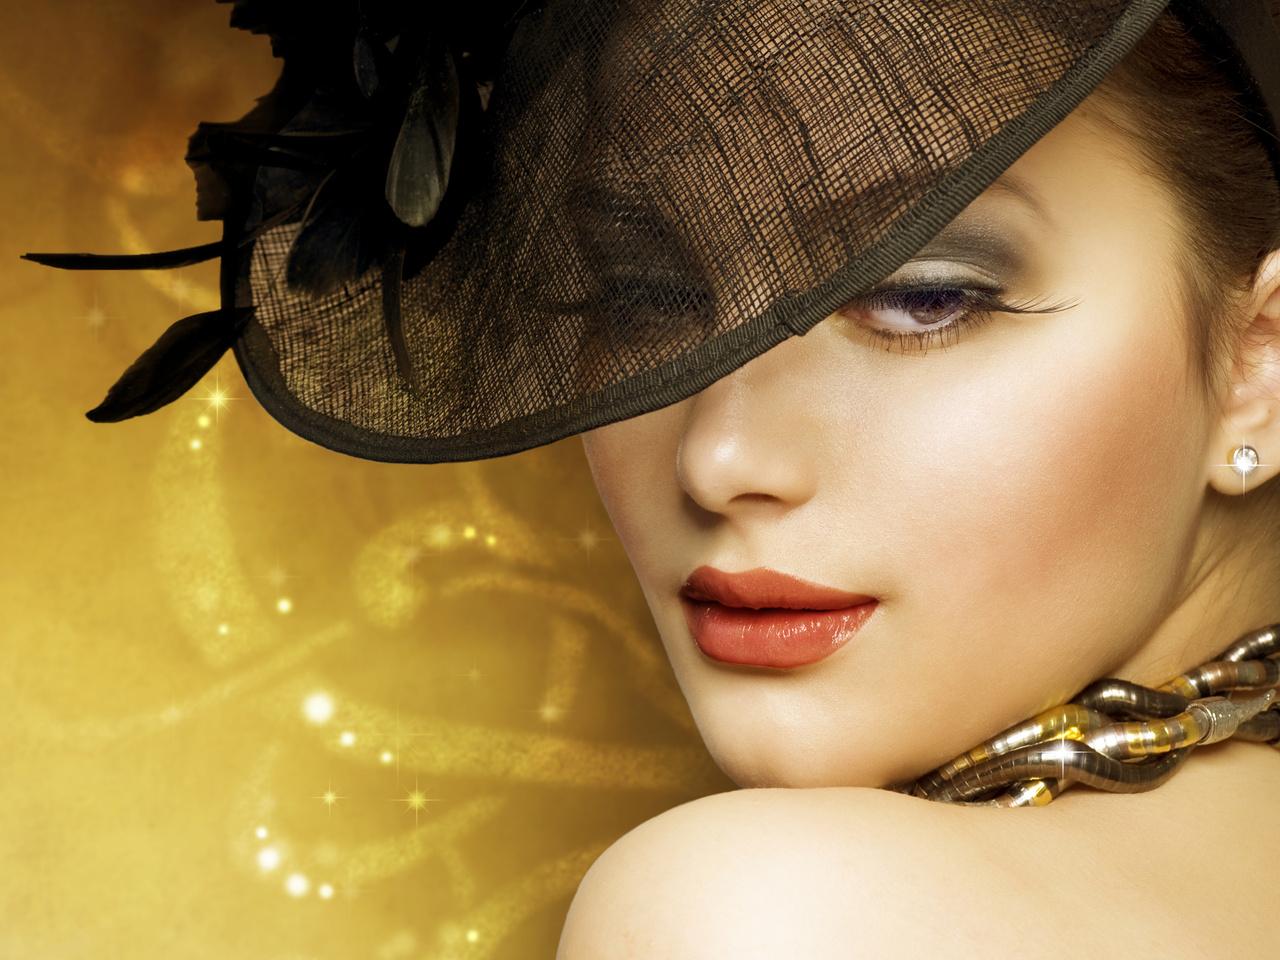 Beautiful Women Hd Wallpaper Wallpapersafari